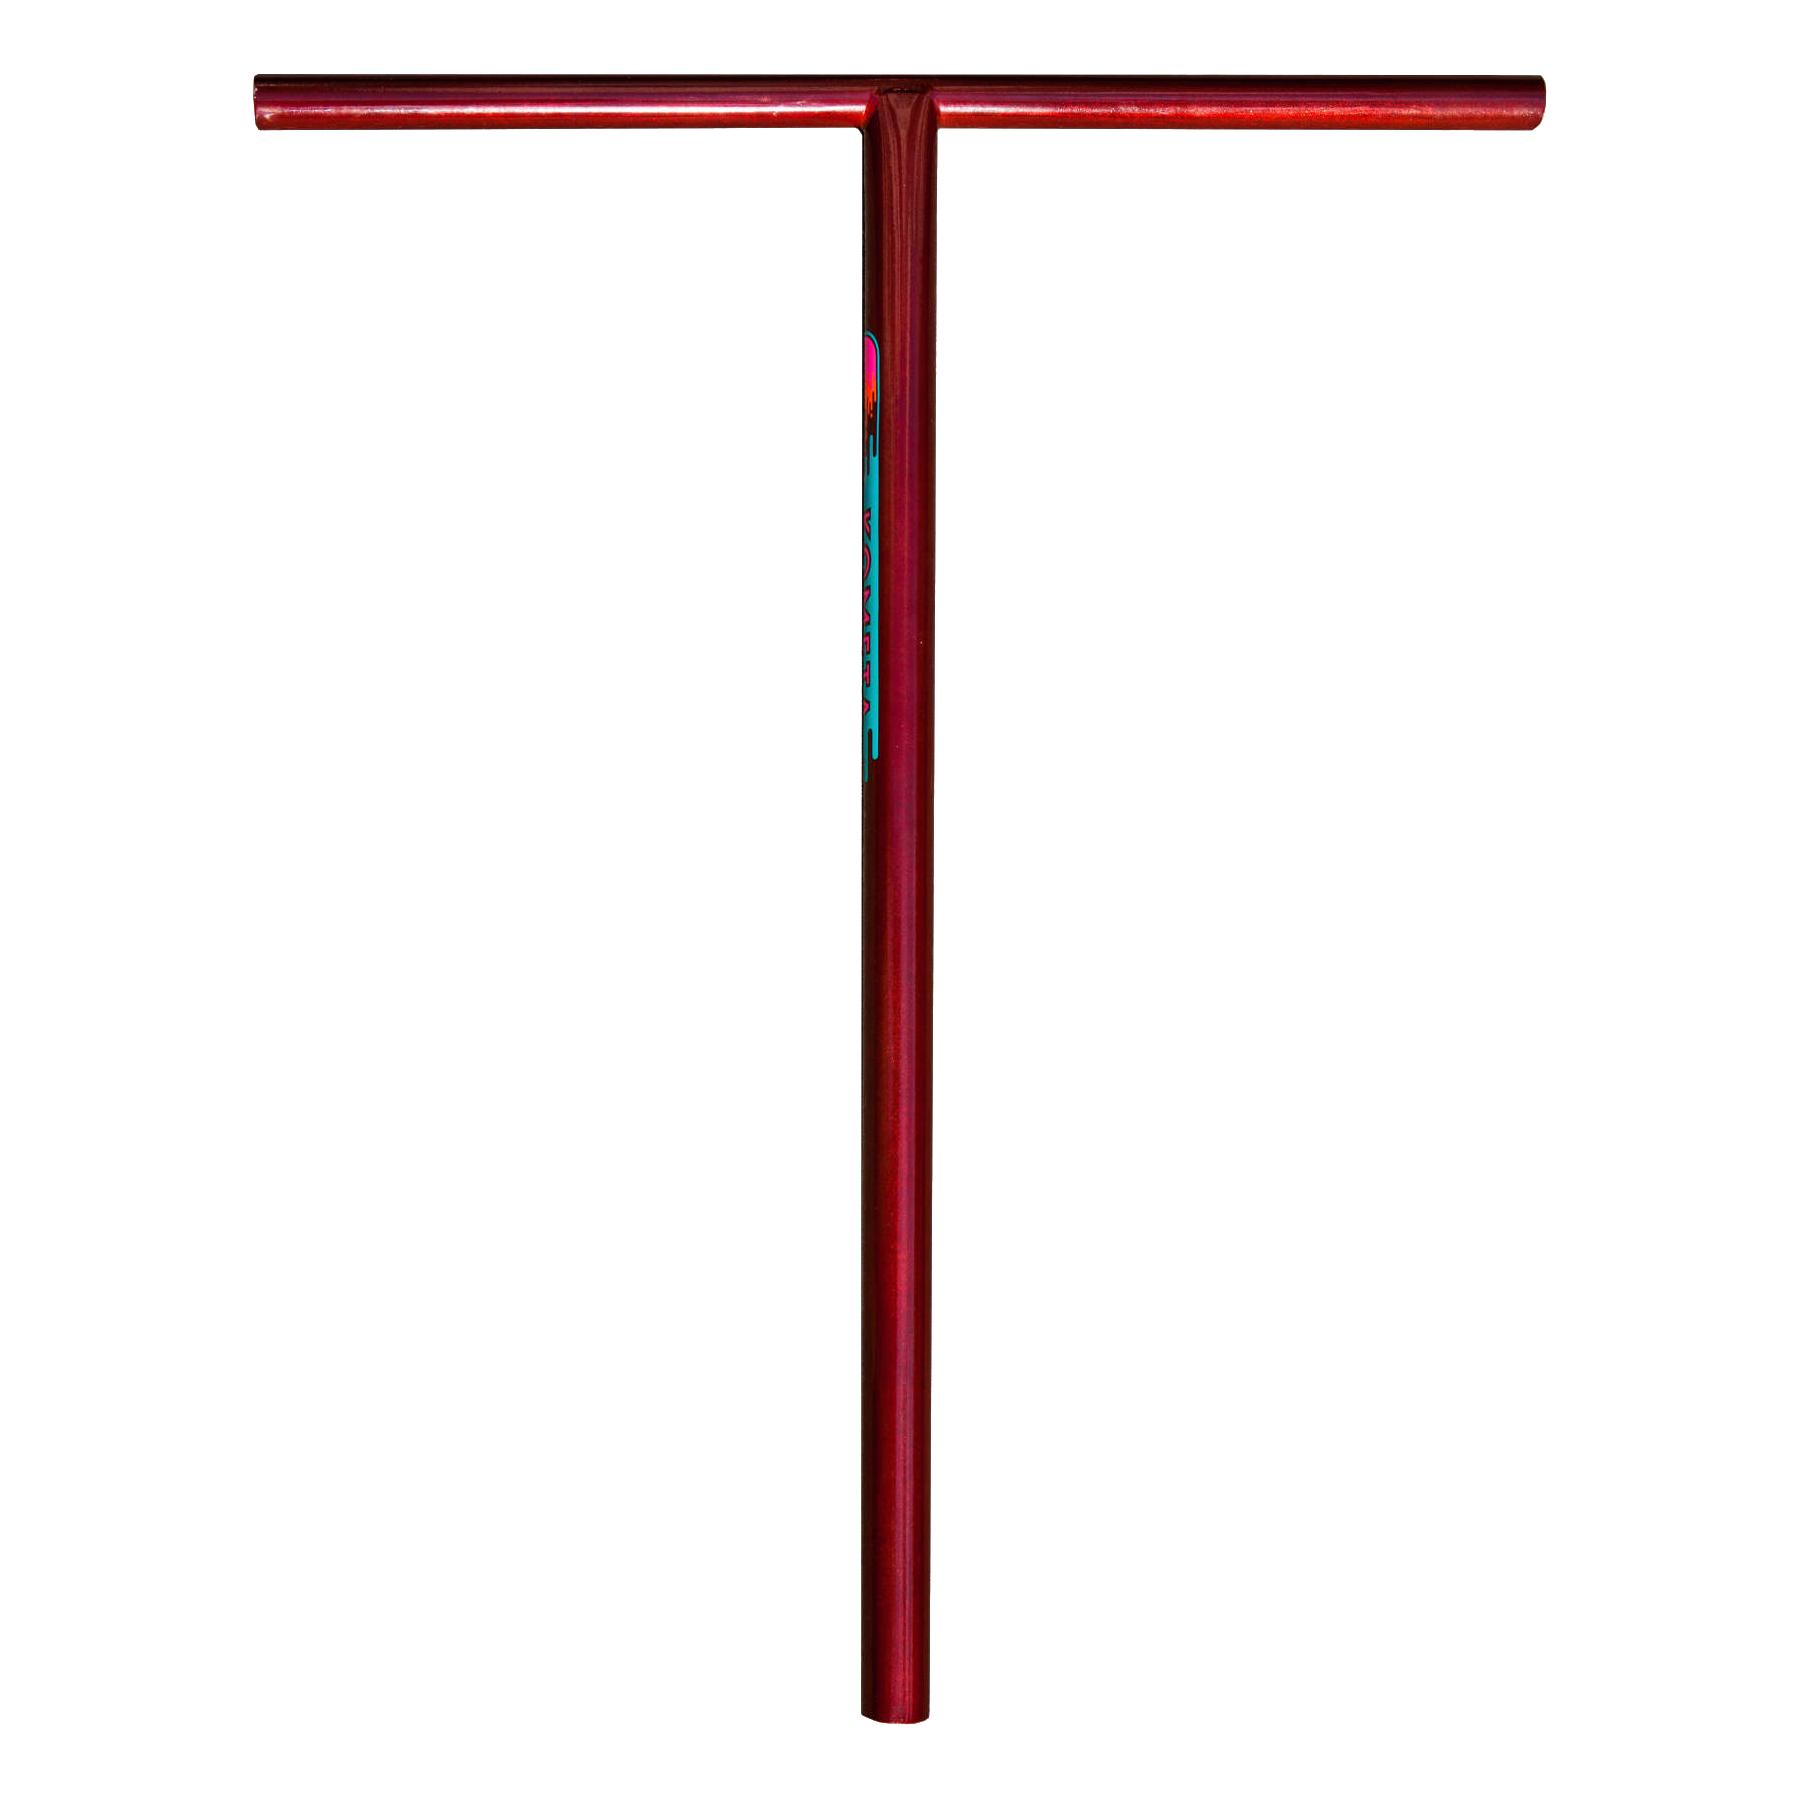 Руль для трюкового самоката КОМЕТА V2 Oversized 34.9 (Ruby)